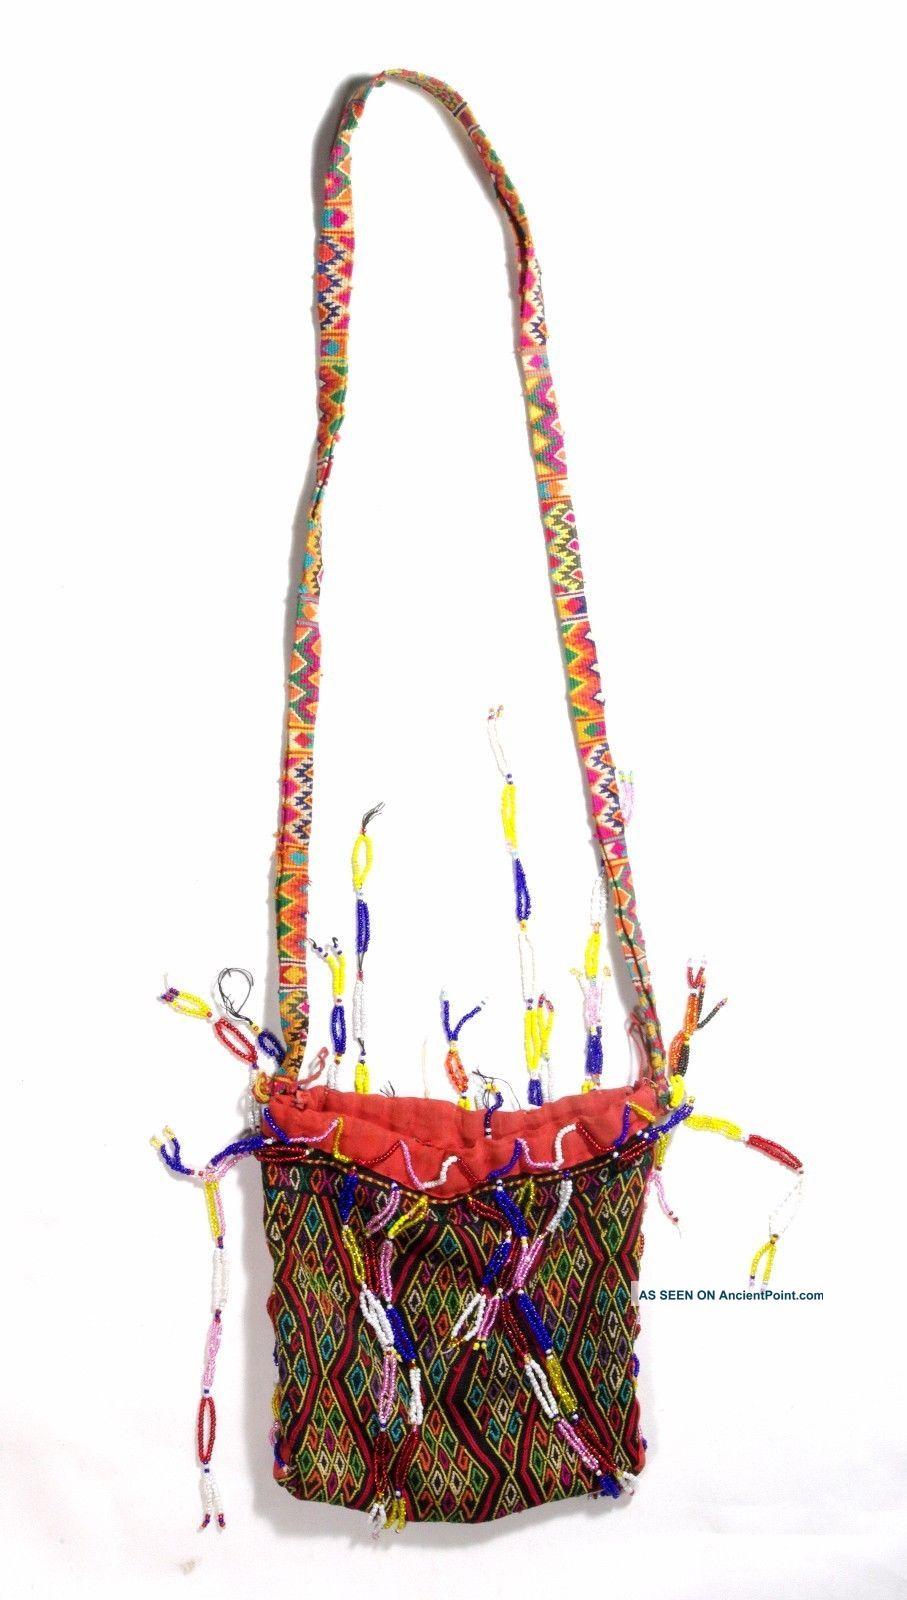 Timor Hand Made Textile Purse Bag - Atoni - Tribal Artifact Pacific Islands & Oceania photo